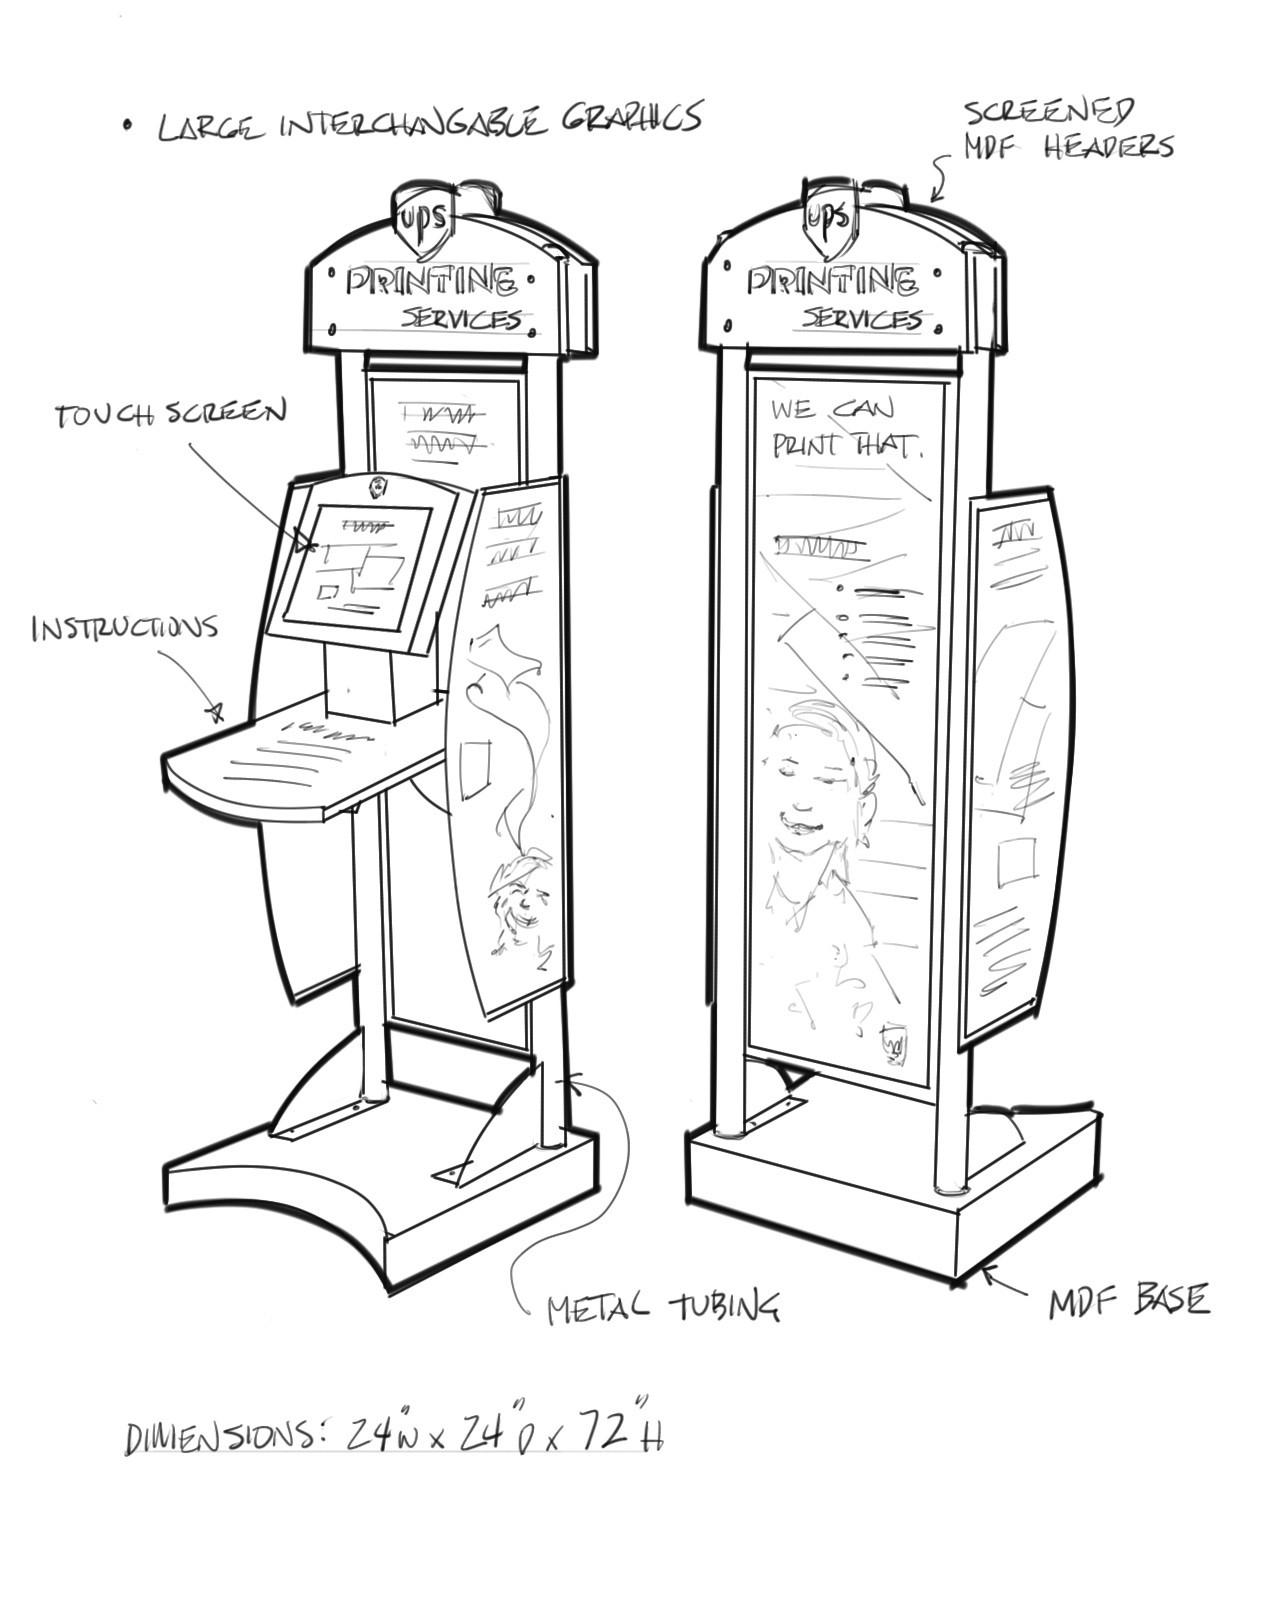 UPS Store Kiosk Concept A.jpg